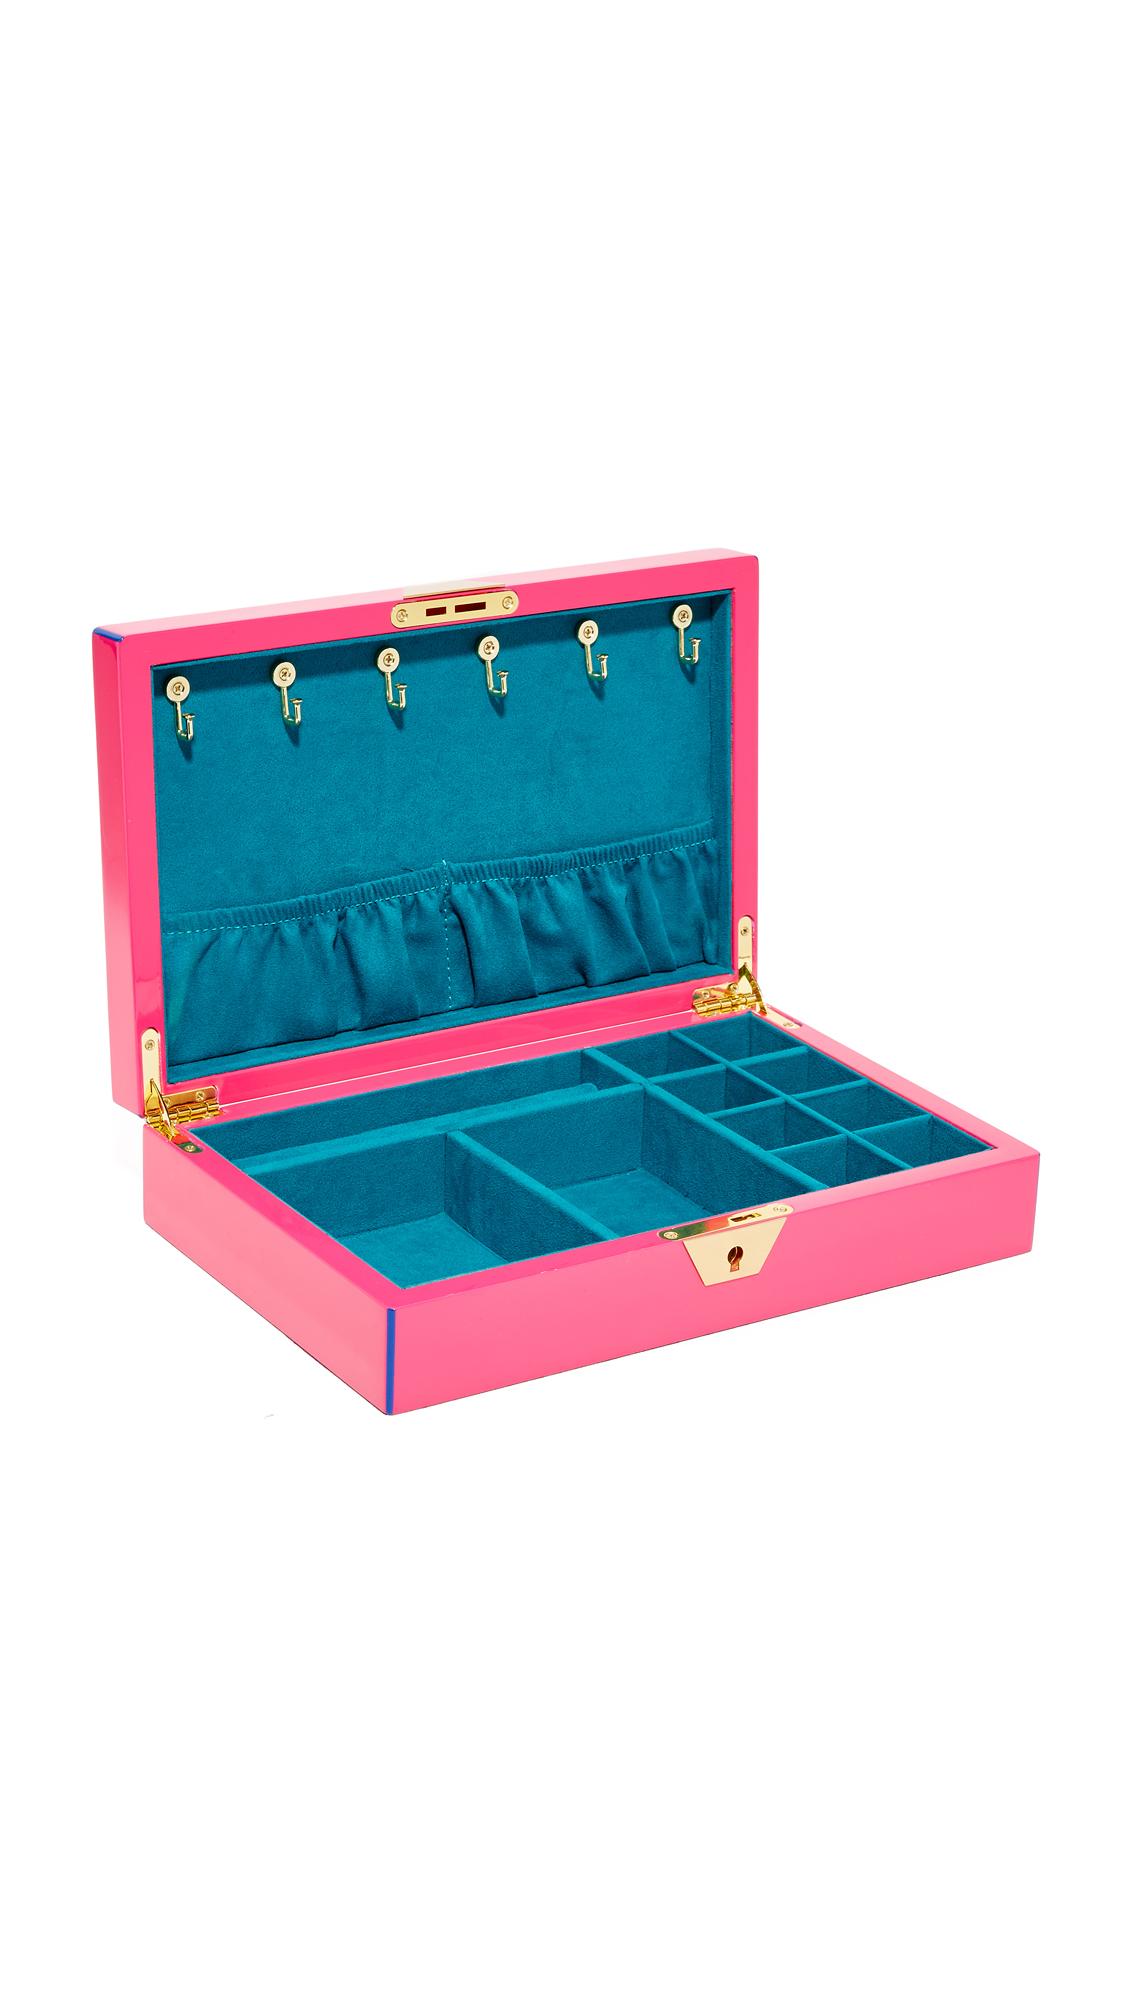 Jonathan Adler Jewelry Box - Fuchsia